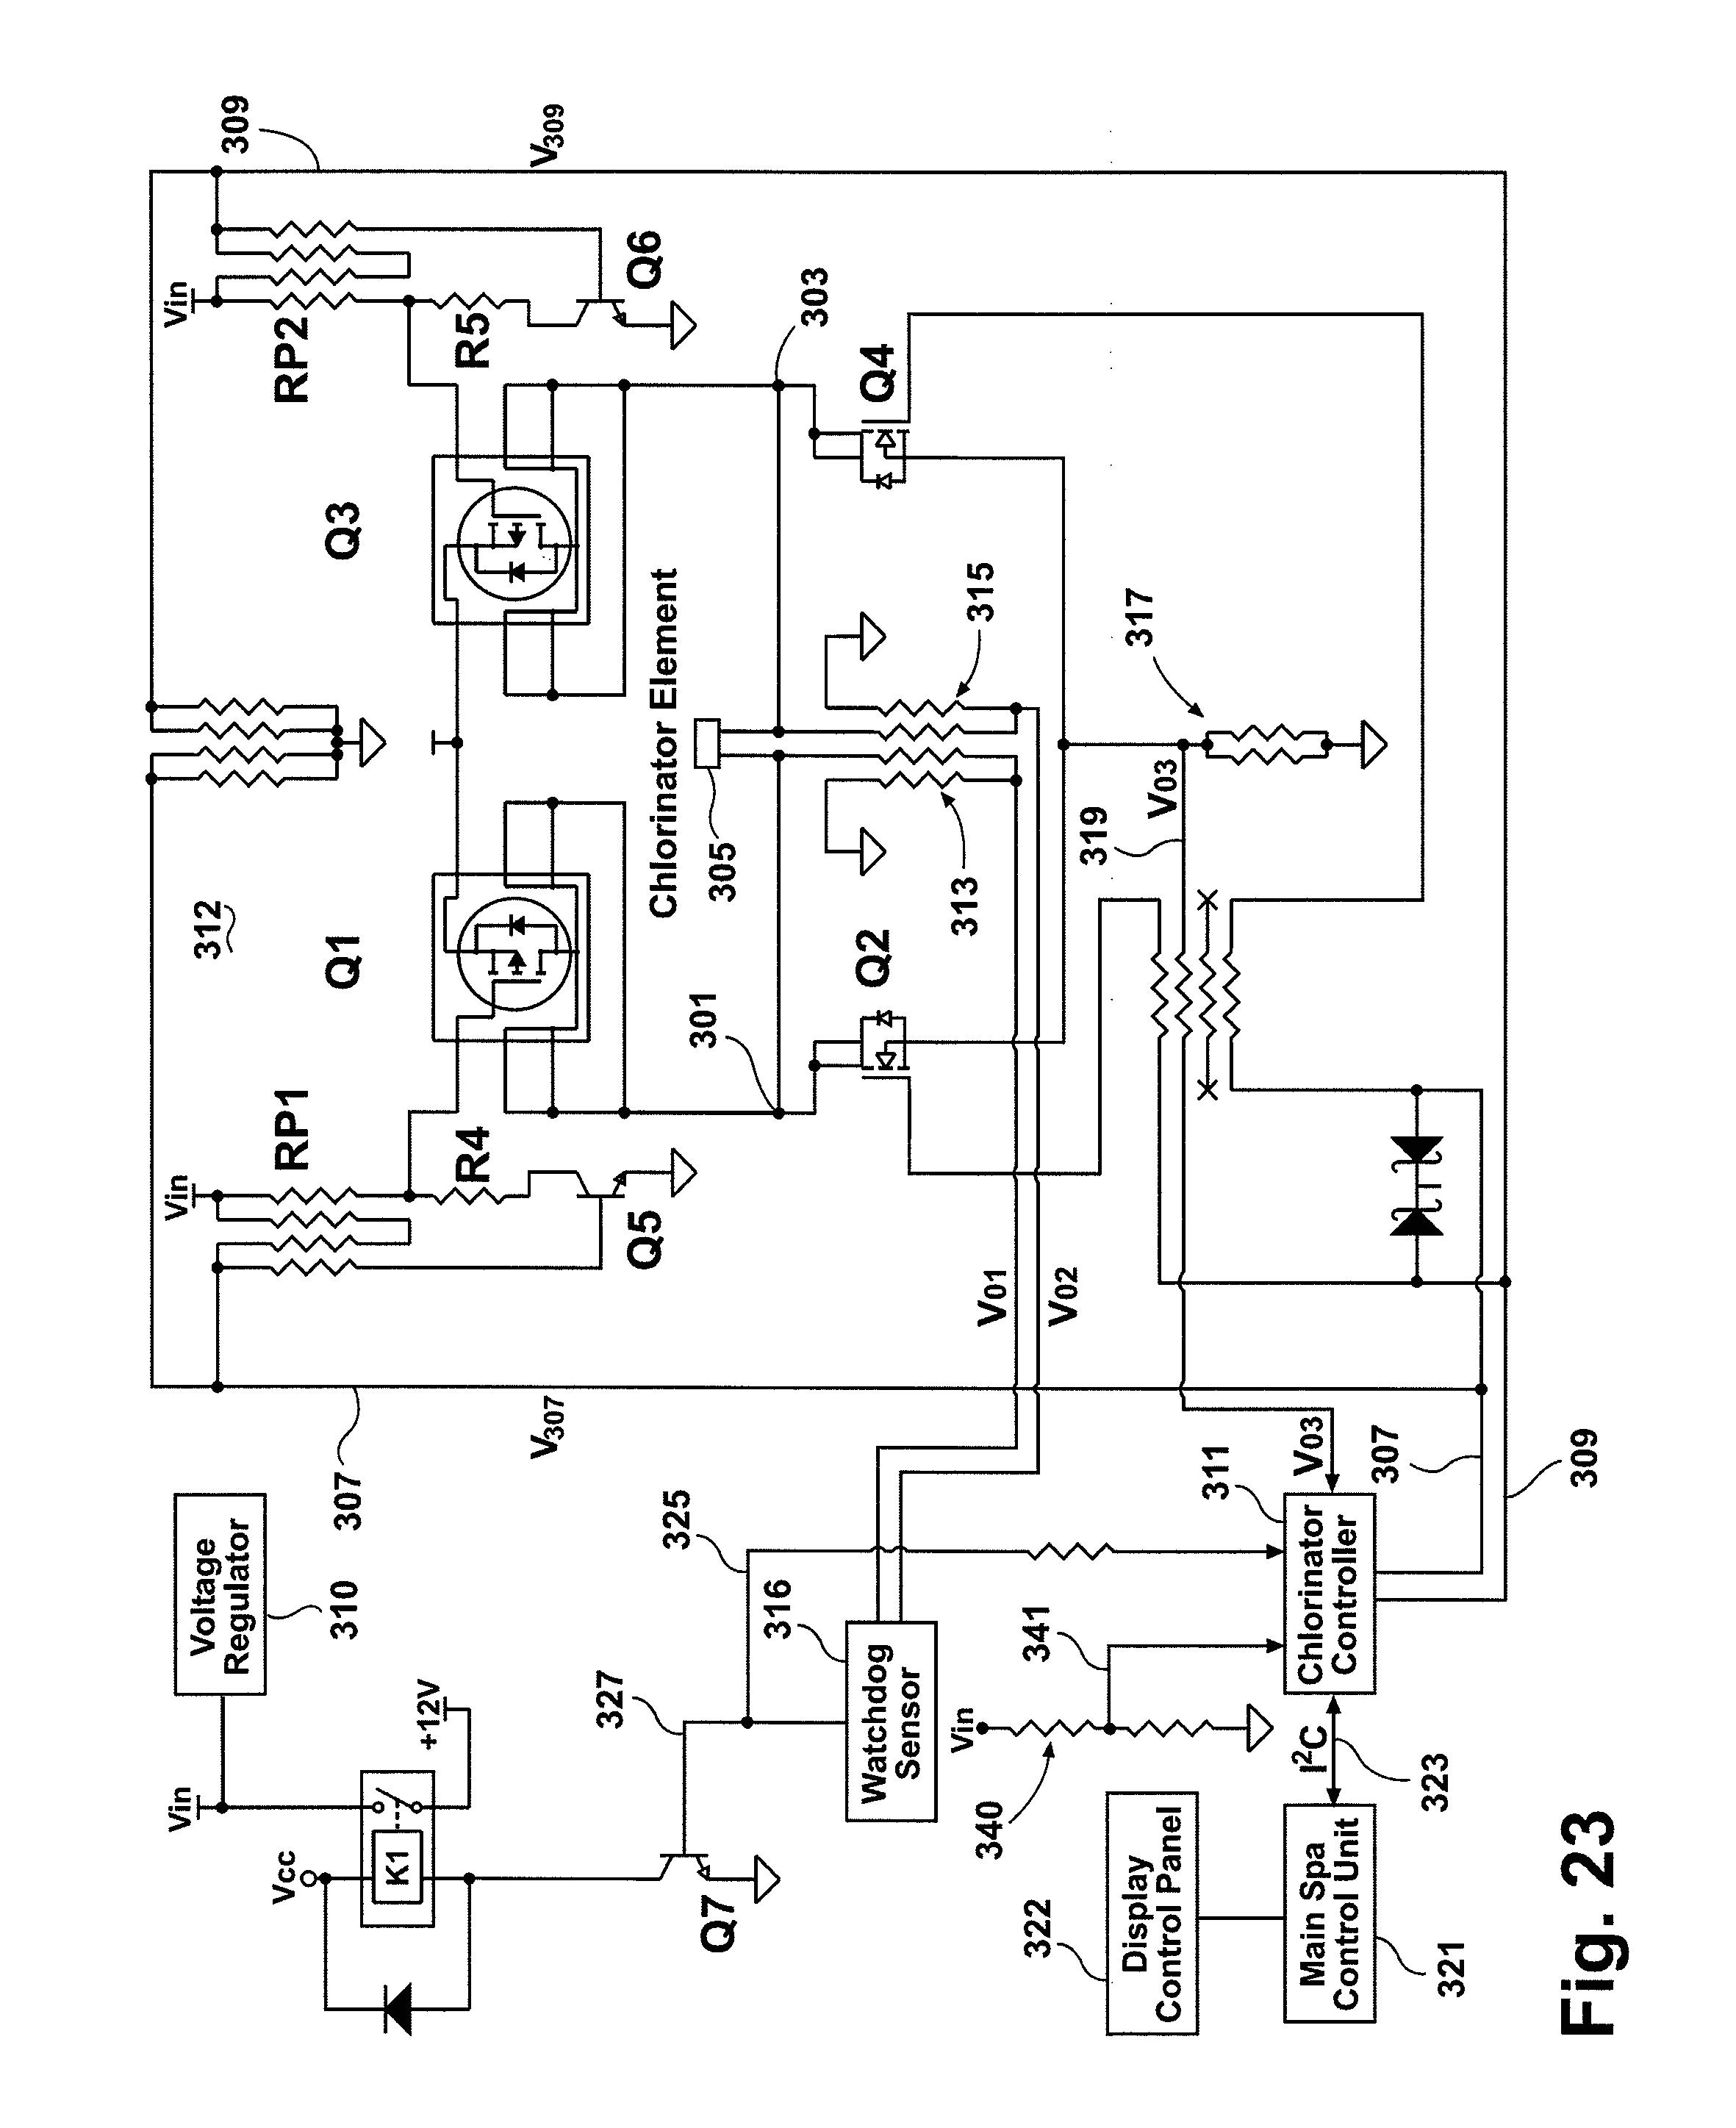 morgan spas wiring diagram wiring diagrams data morgan spa instructions morgan spa diagram